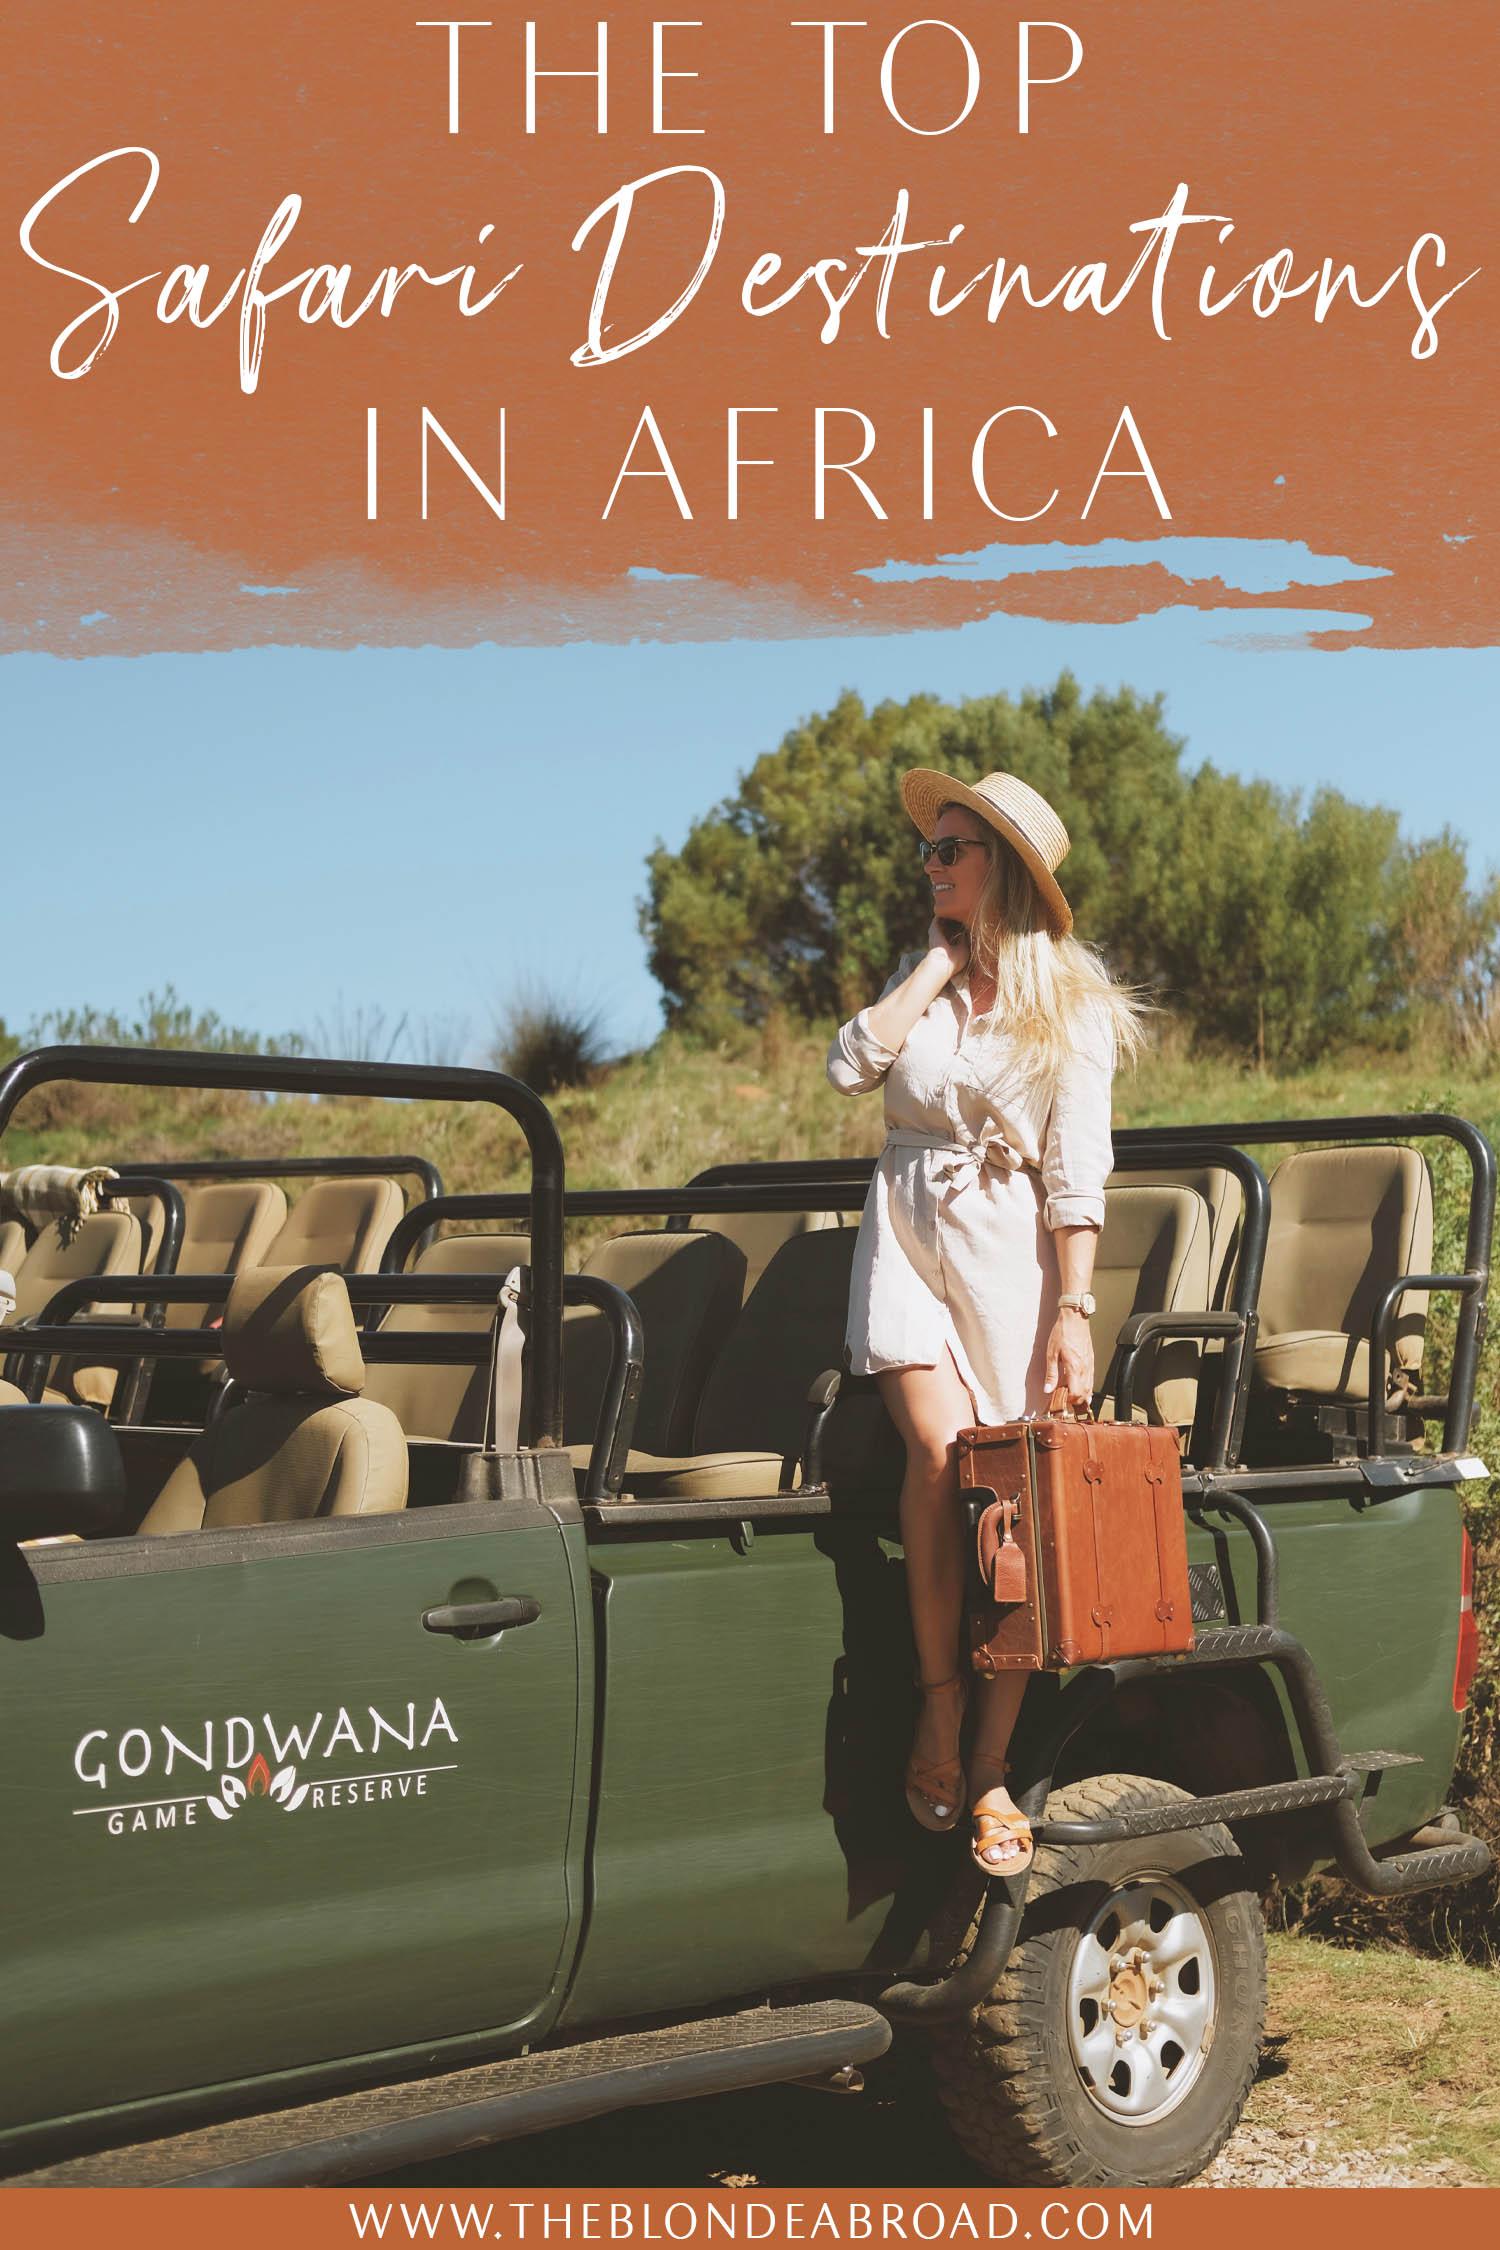 Top Safari Destinations in Africa